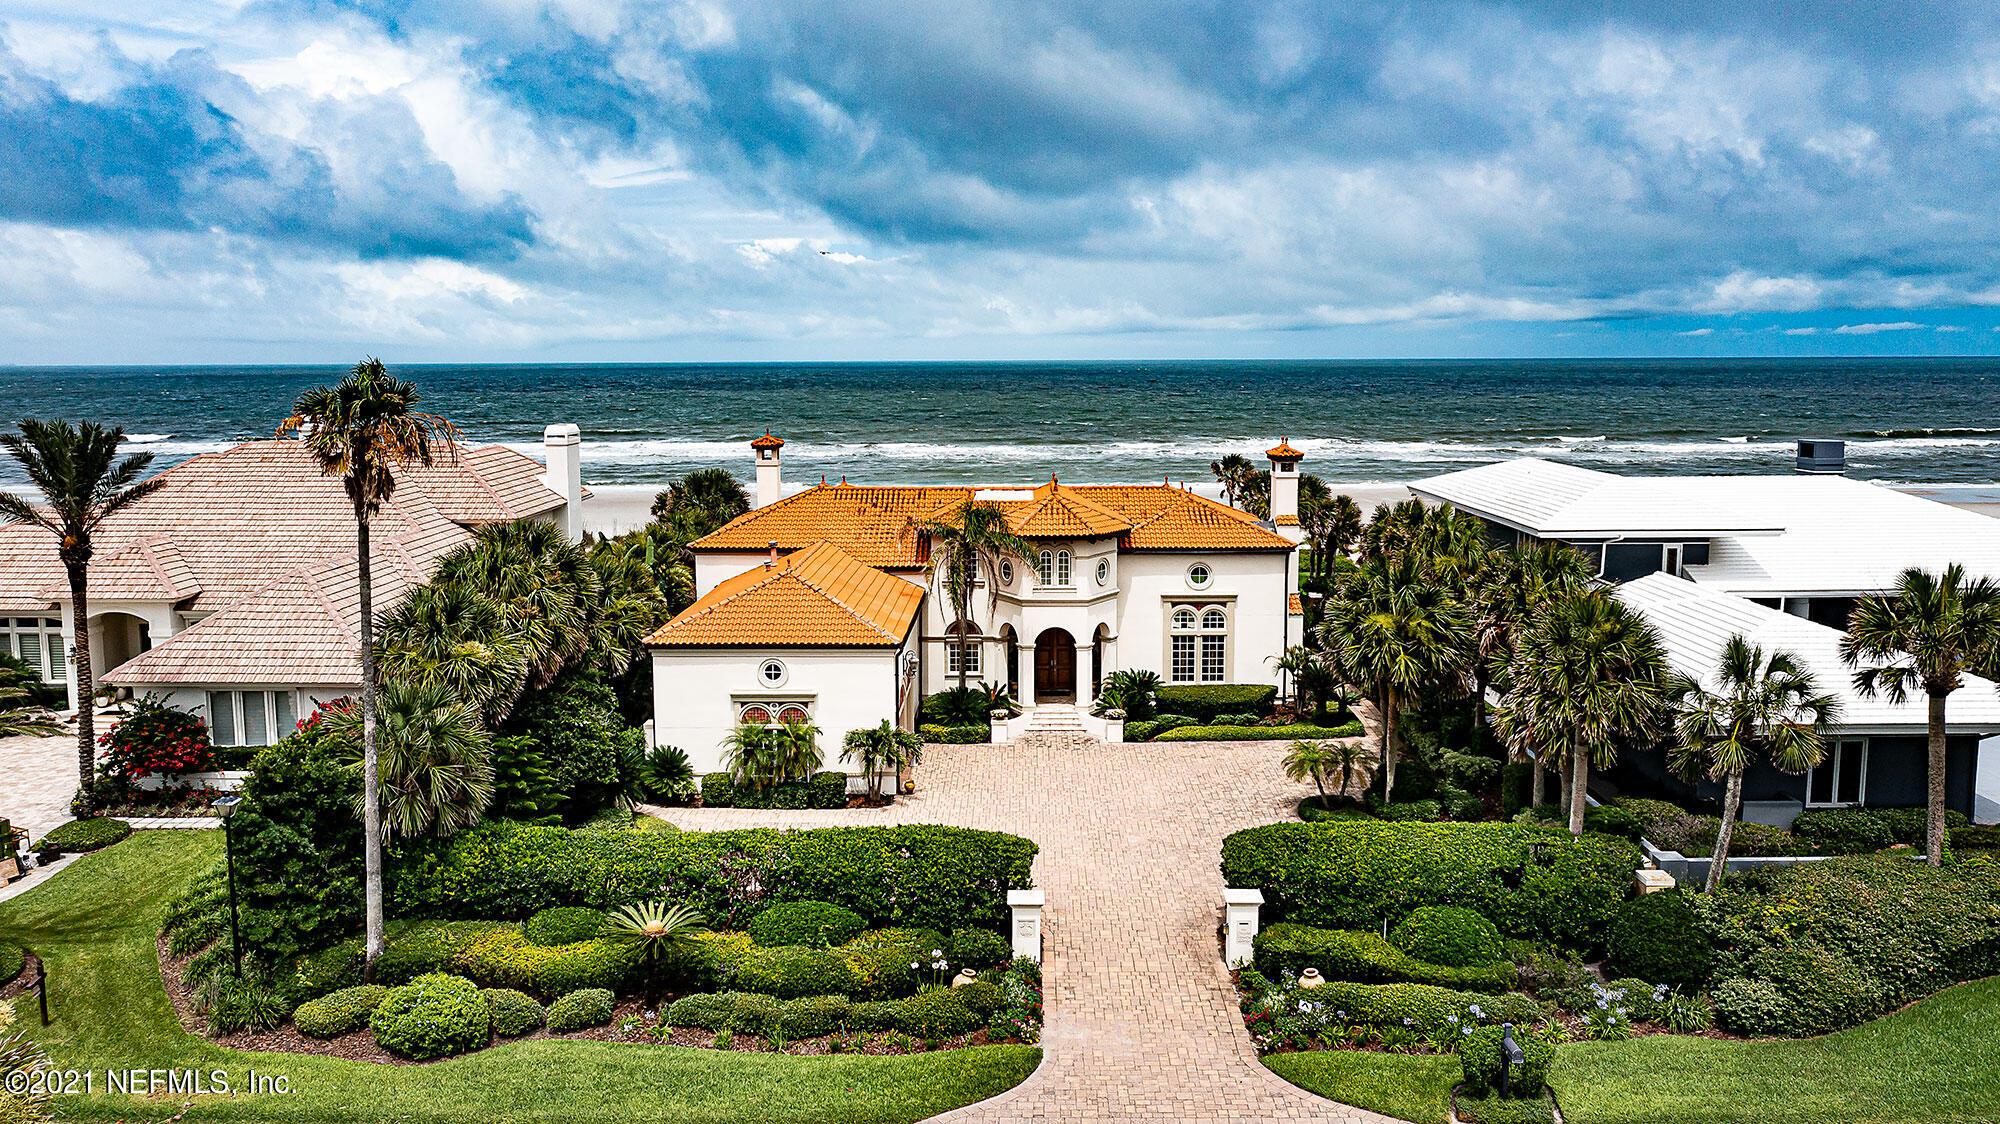 81 PONTE VEDRA, PONTE VEDRA BEACH, FLORIDA 32082, 5 Bedrooms Bedrooms, ,5 BathroomsBathrooms,Residential,For sale,PONTE VEDRA,1117757